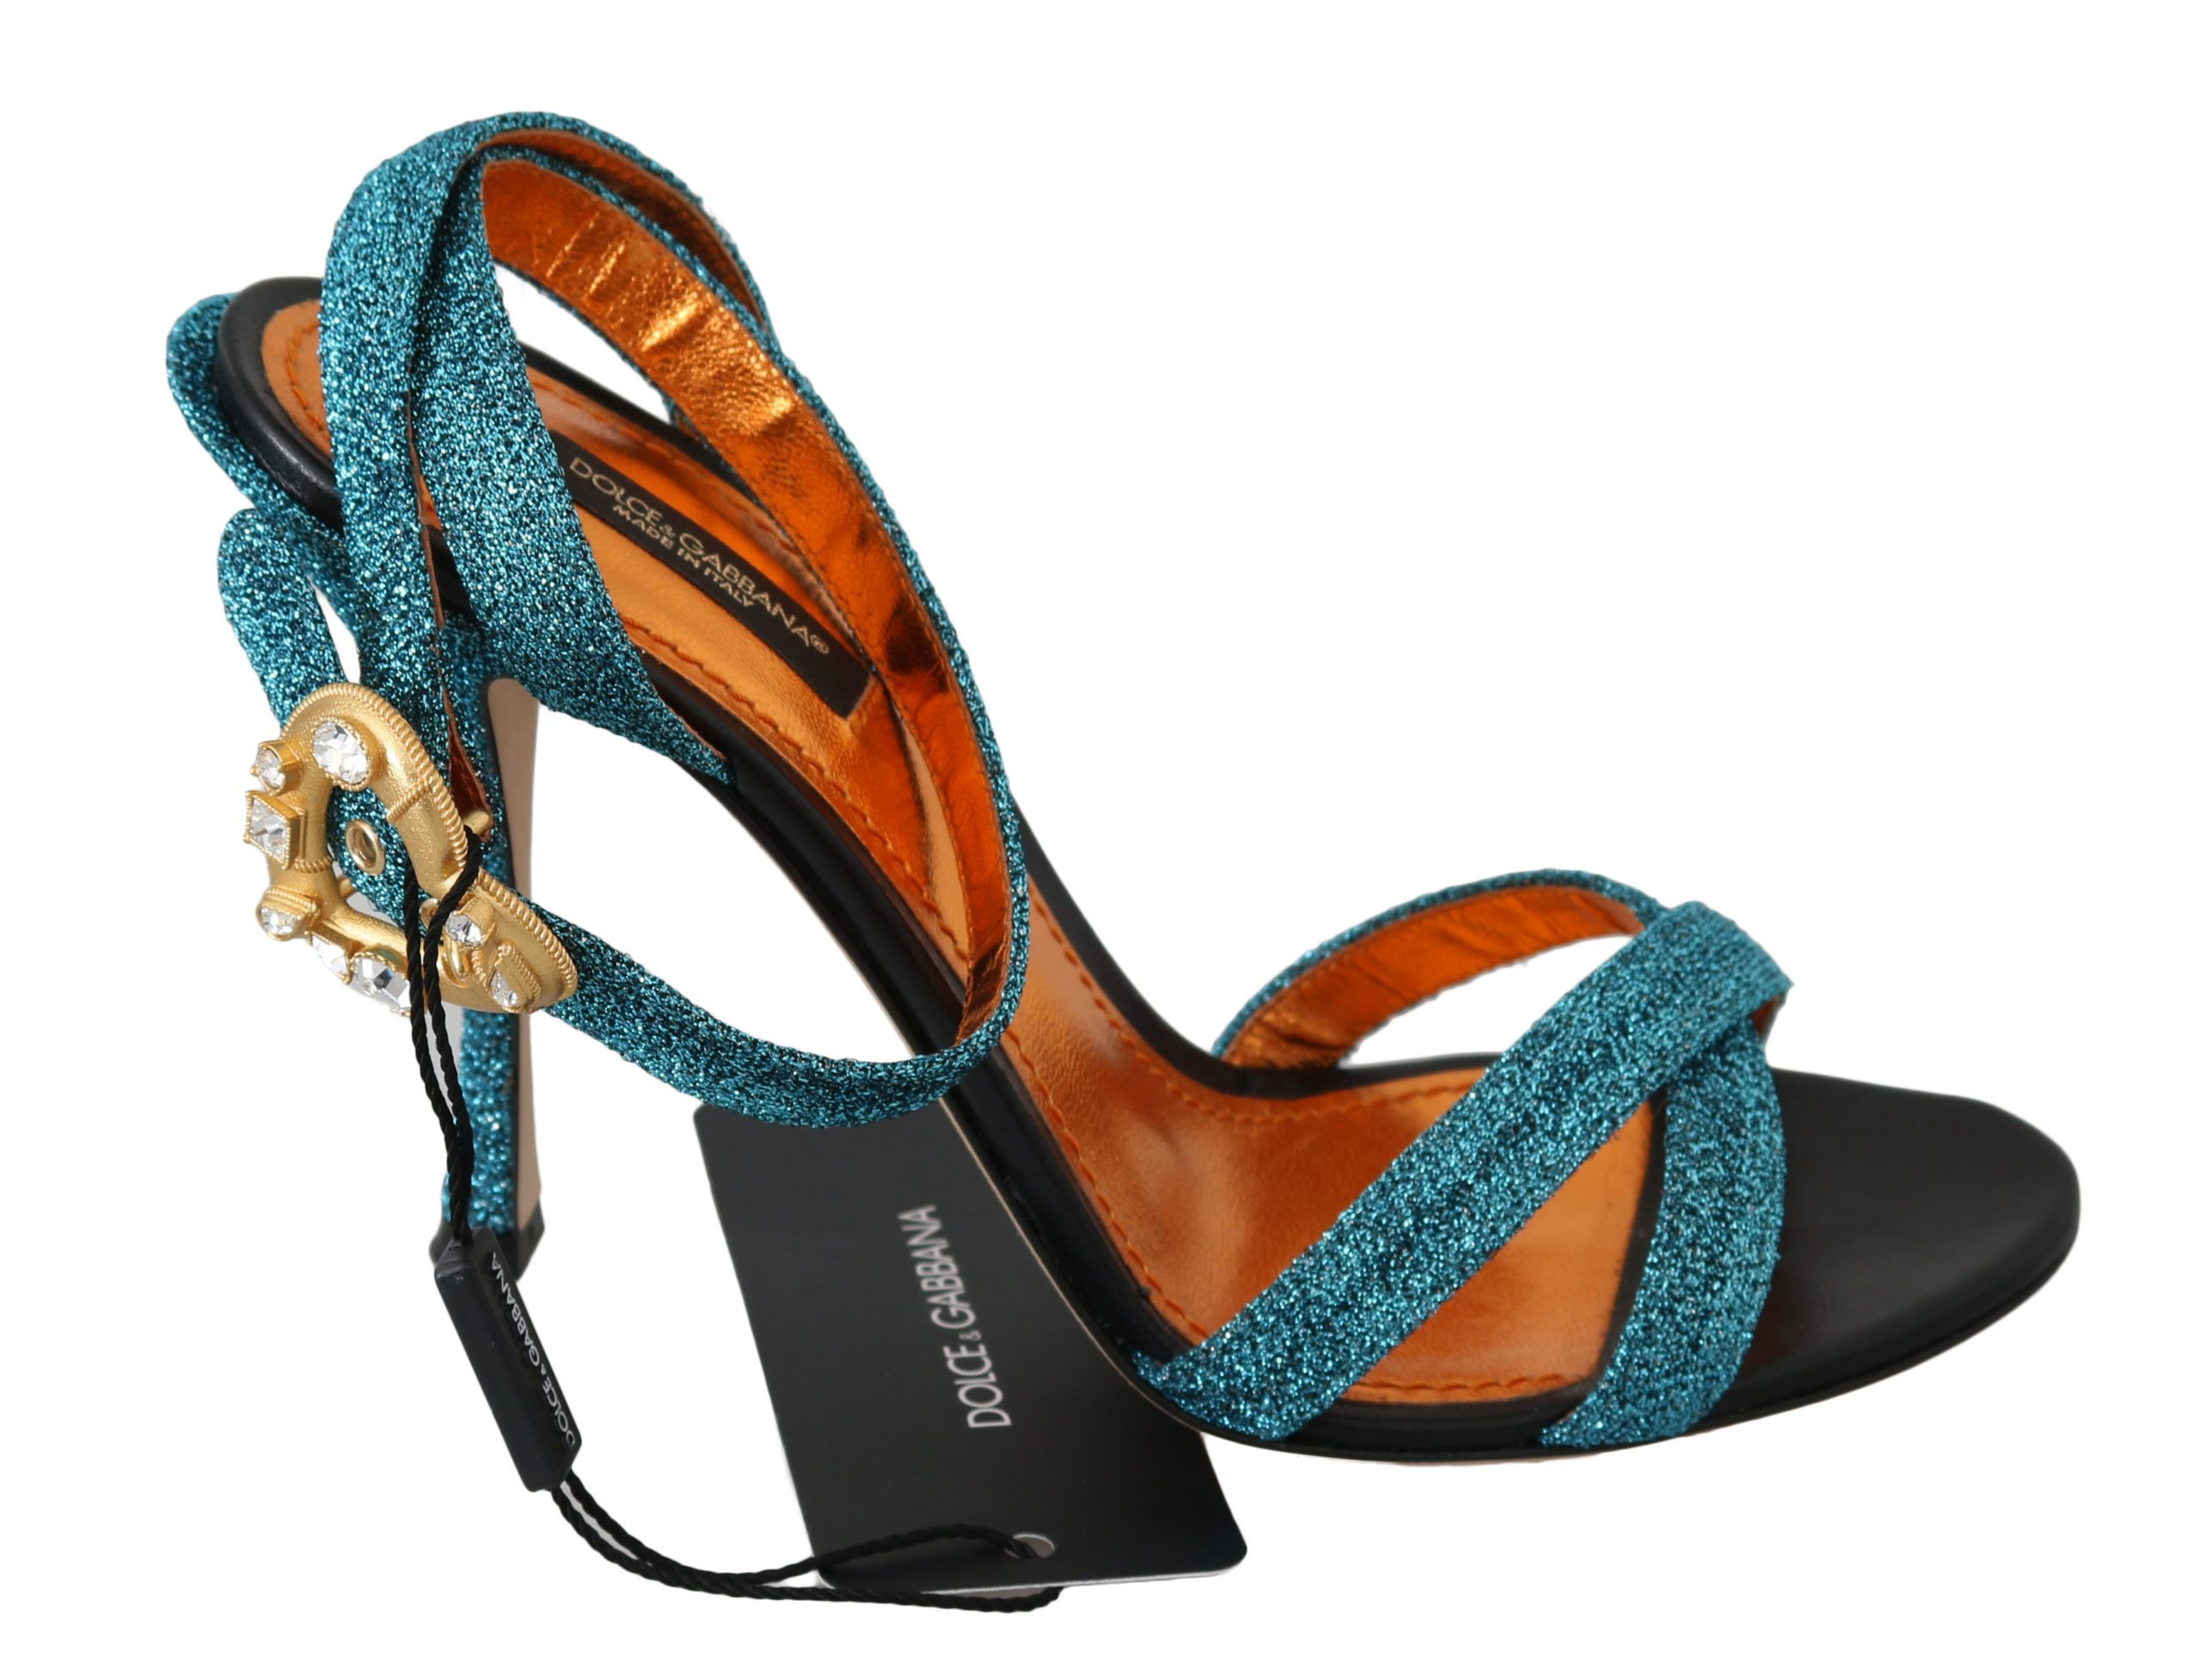 Dolce & Gabbana Women's Crystal Gold Heart Sandals Blue LA6254 - EU35/US4.5